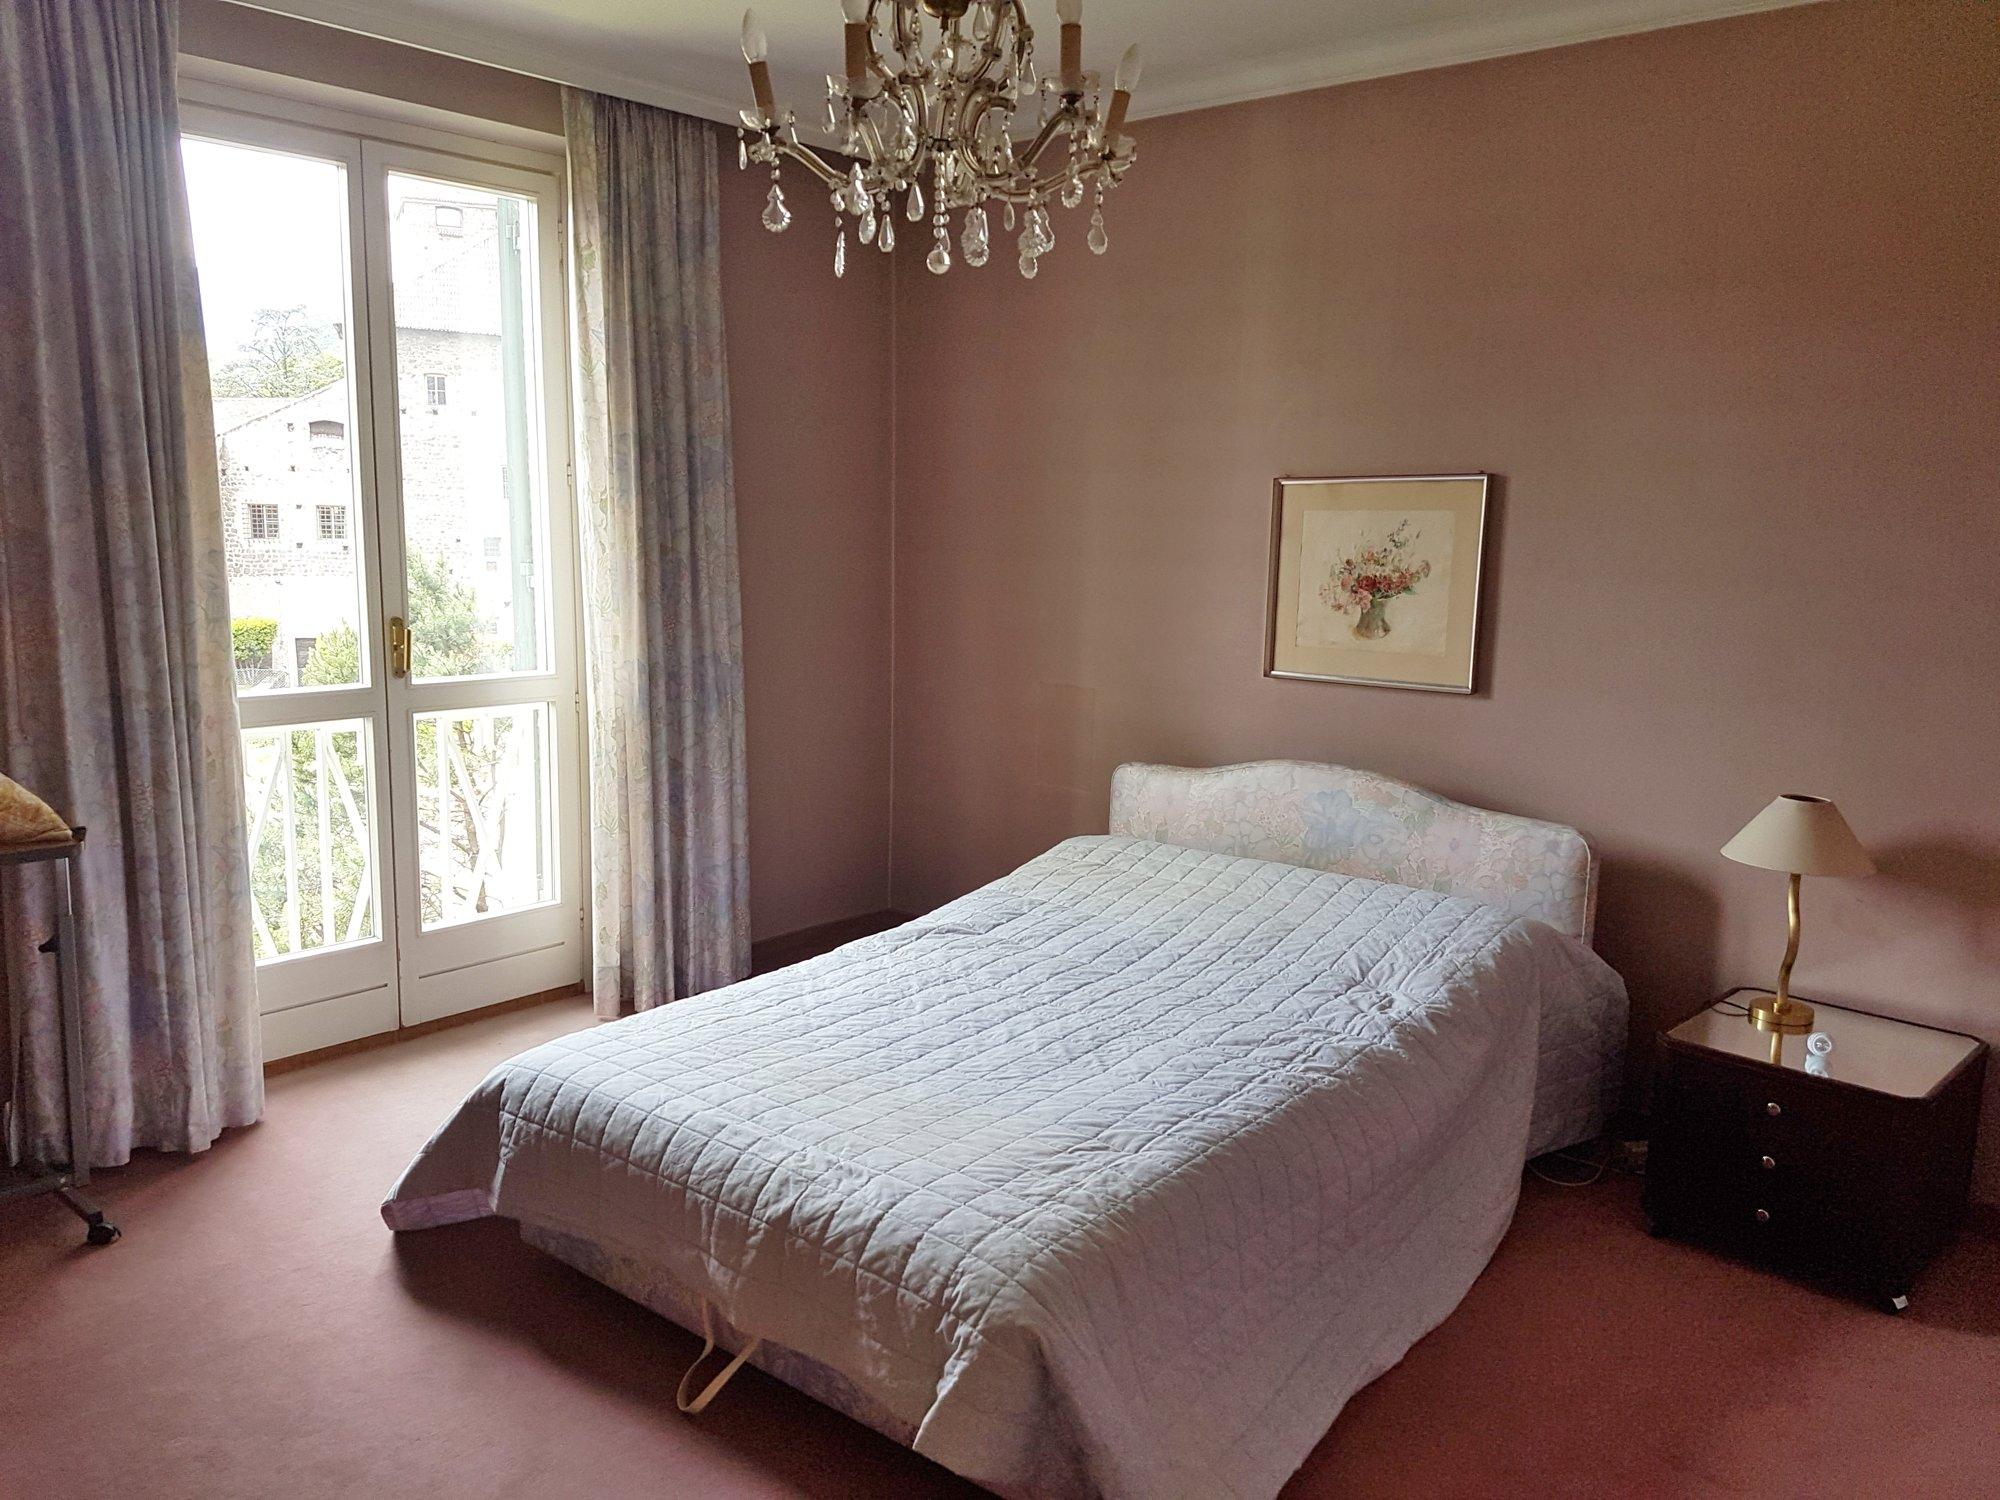 großes Schlafzimmer_stanza da letto grande